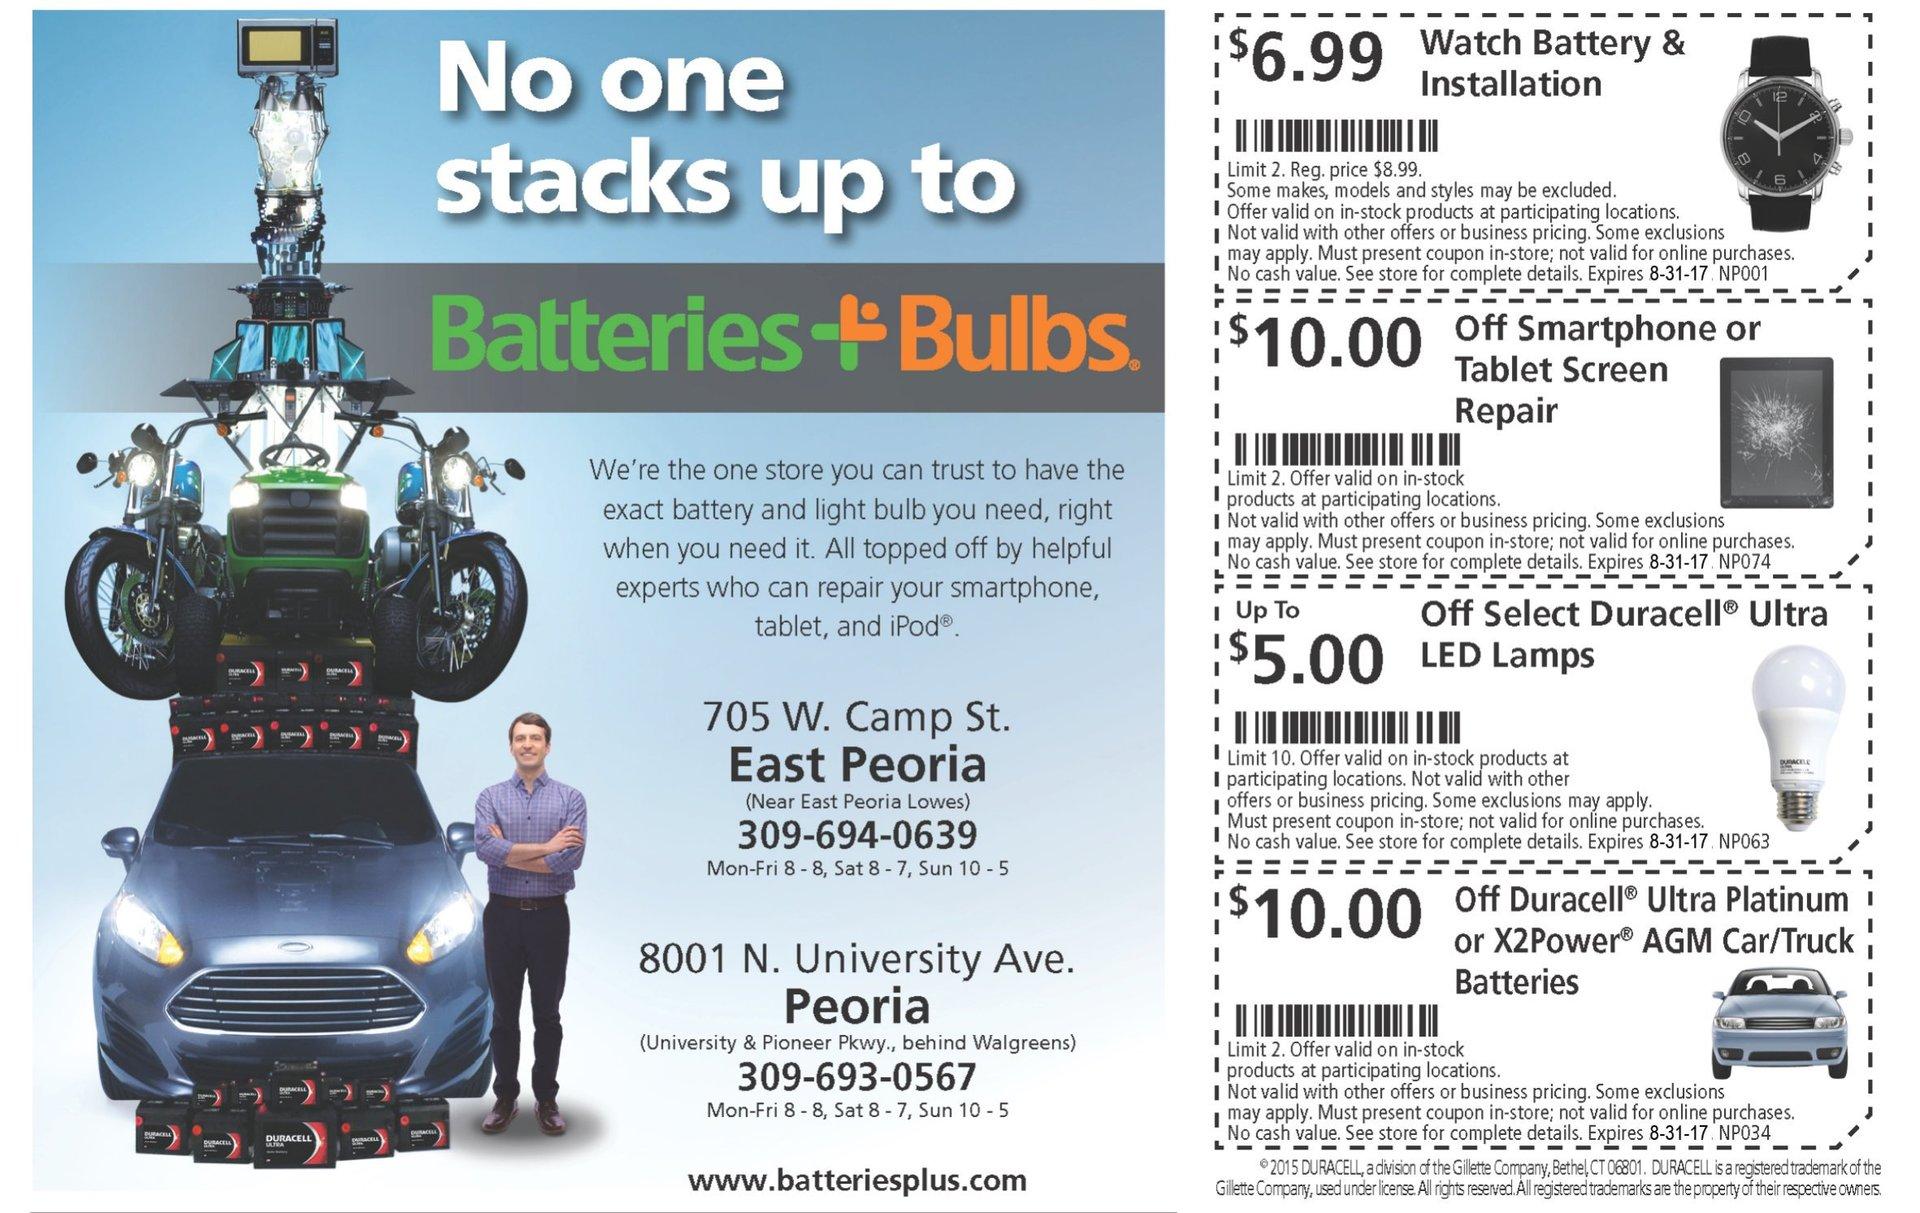 Batteries Plus Bulbs coupons